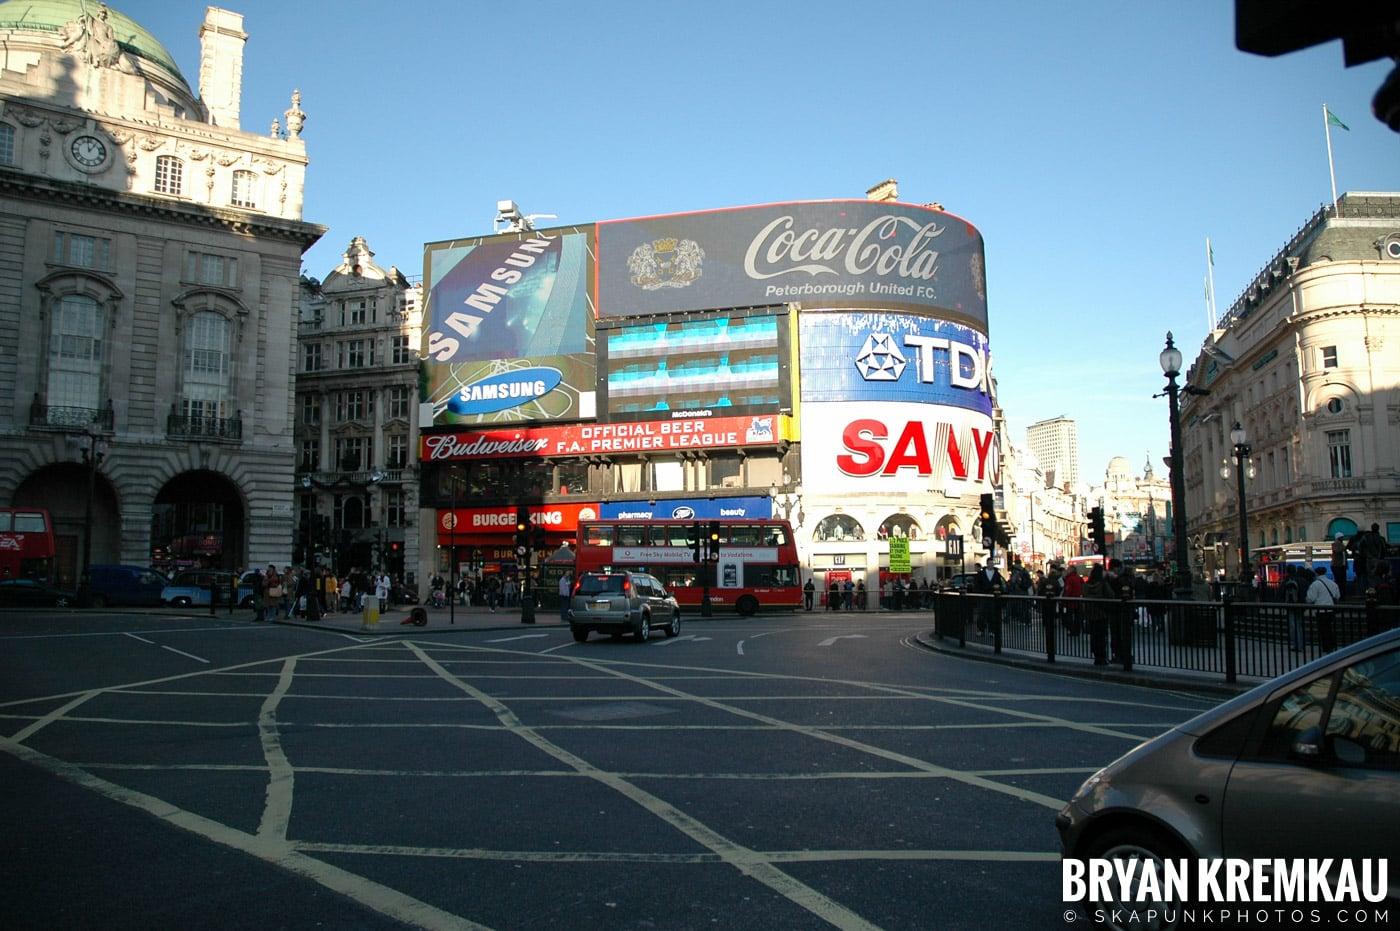 London, England - Day 3 - 12.18.05 (27)